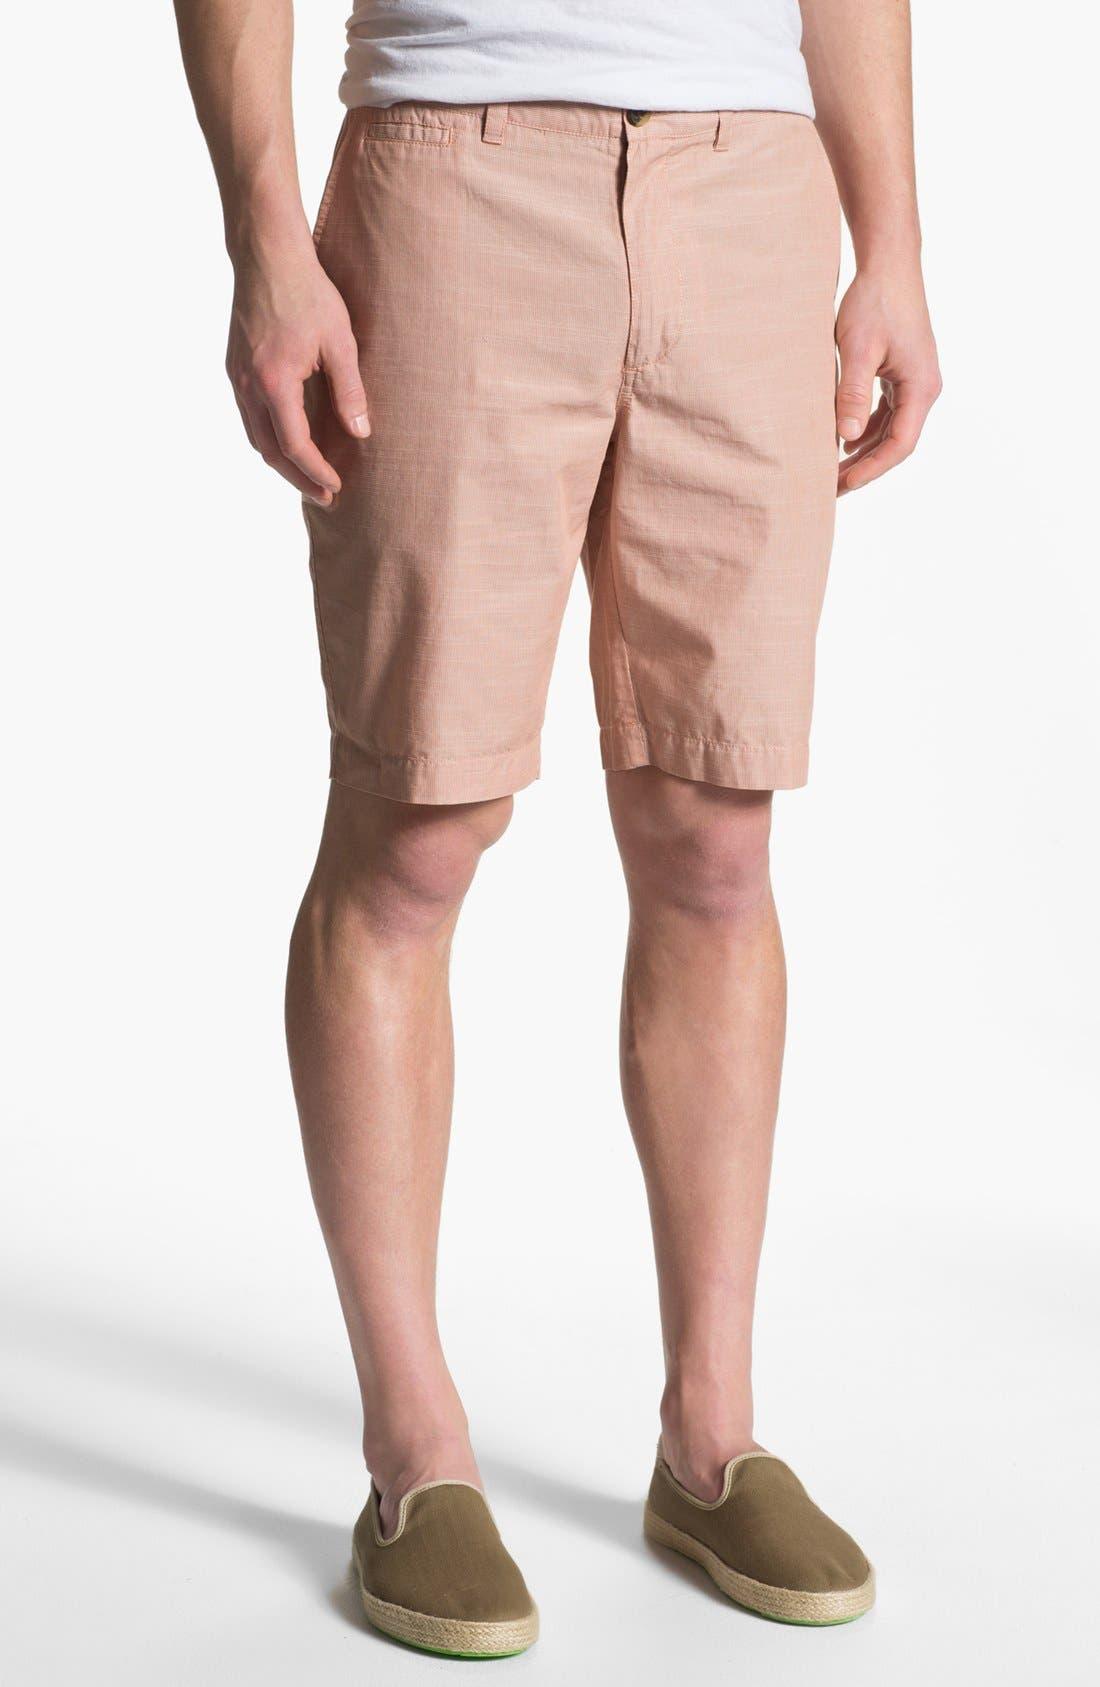 Alternate Image 1 Selected - Wallin & Bros. 'Lanspur' Flat Front Shorts